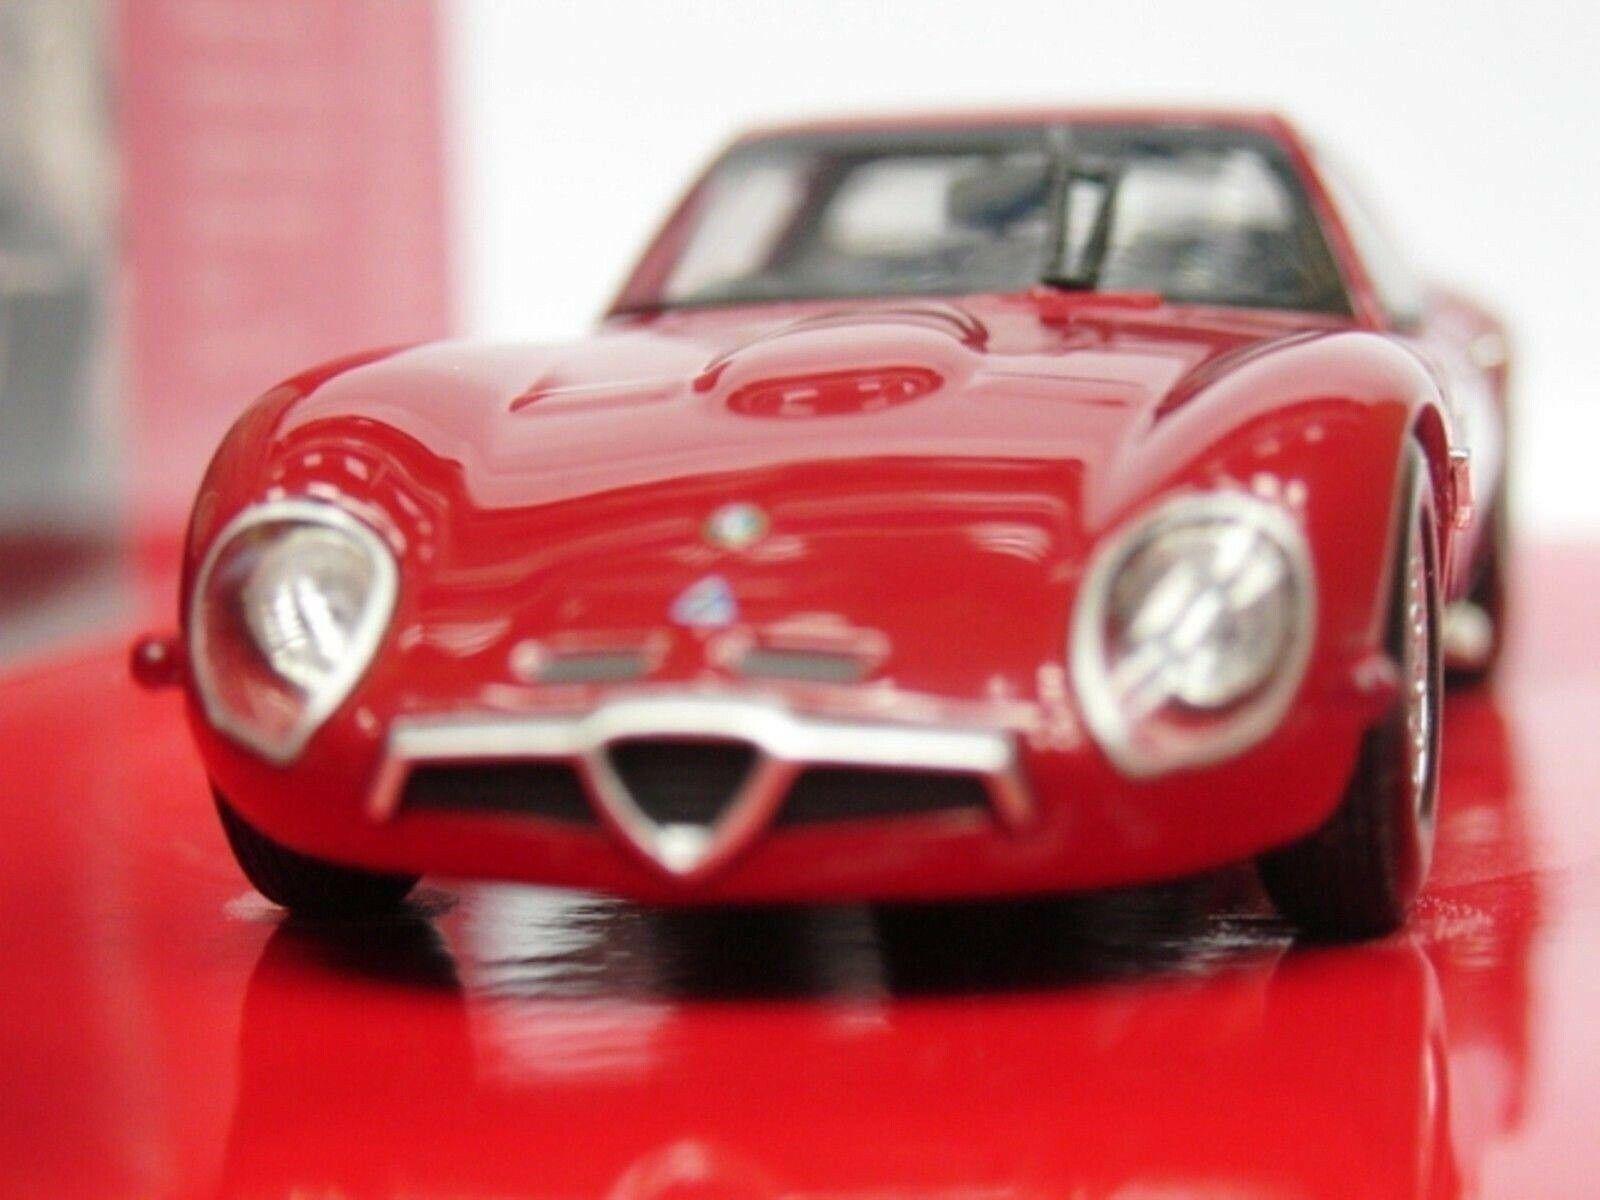 WOW EXTREMELY RARE Alfa Romeo 105.11 Giulia TZ2 1965 Red 1 43 Minichamps-Veloce